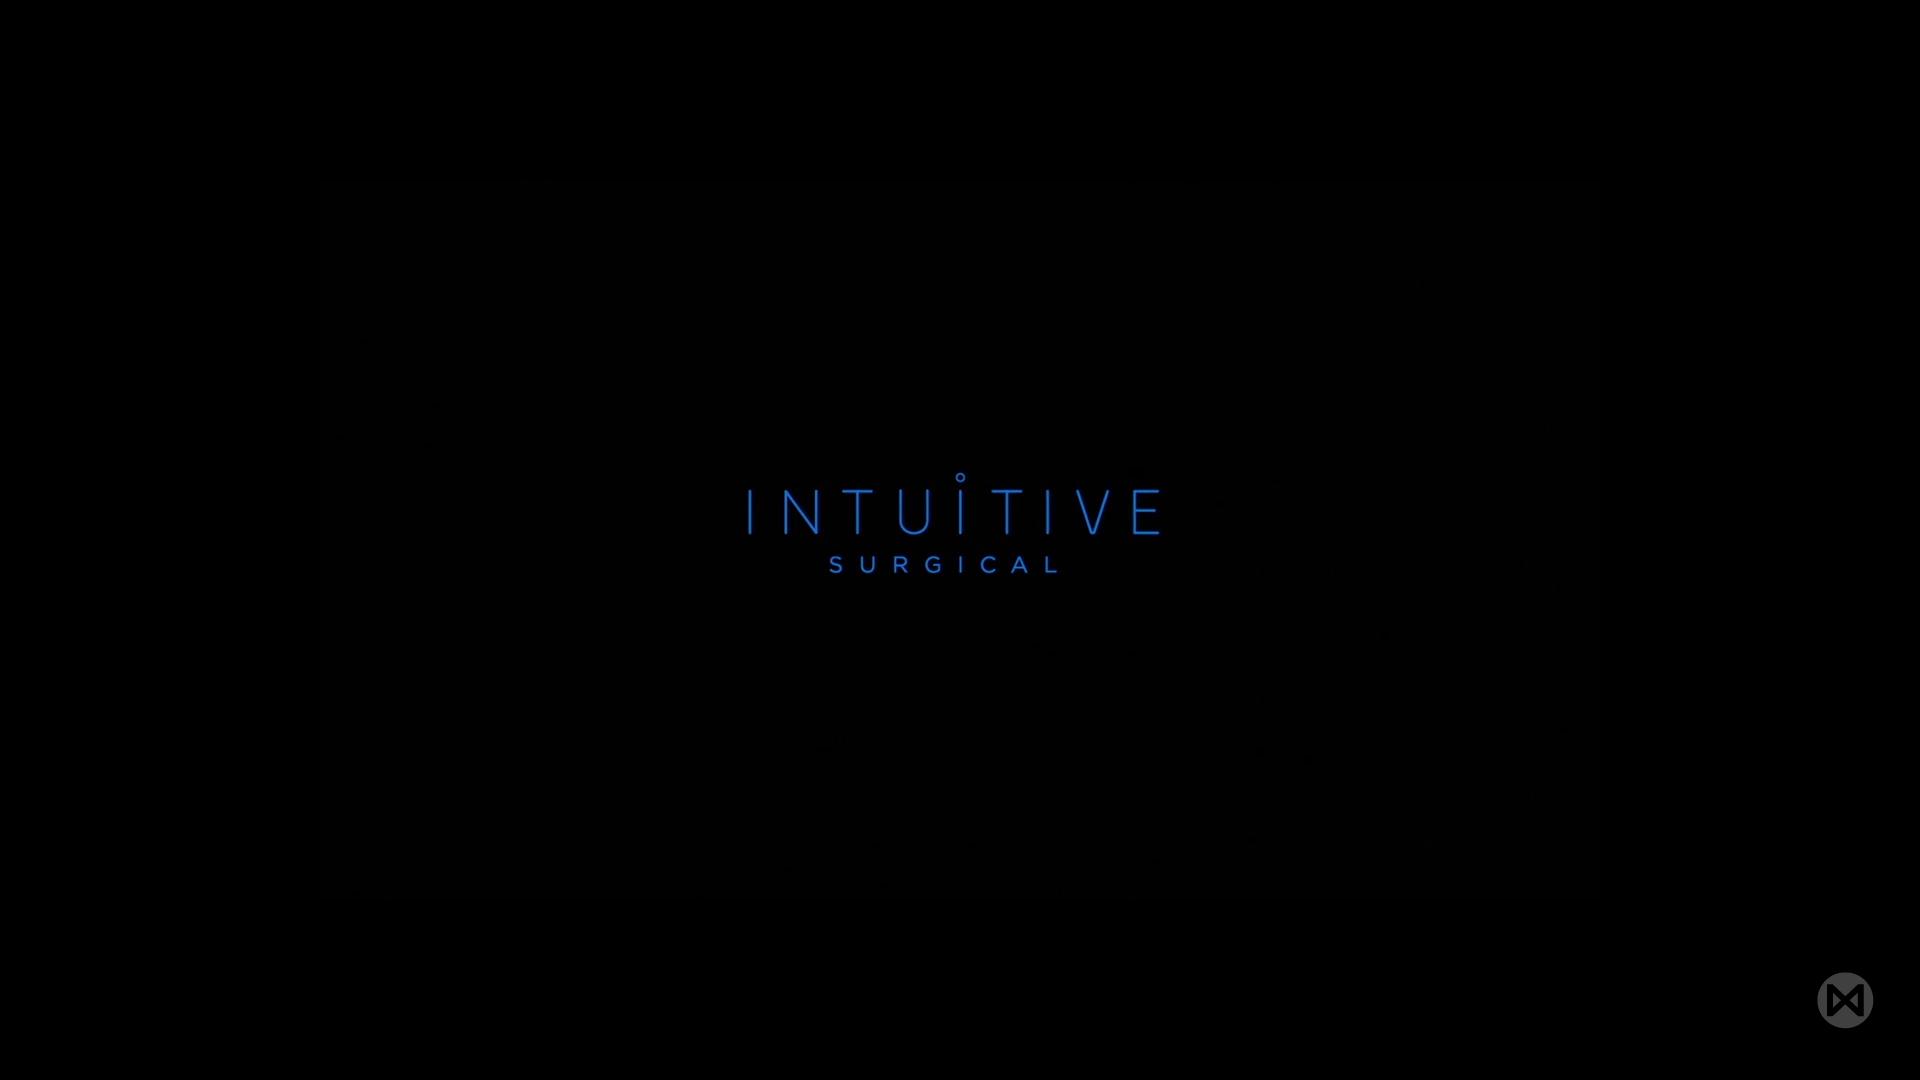 DarkMatter_Intuitive Surgical-13.jpg